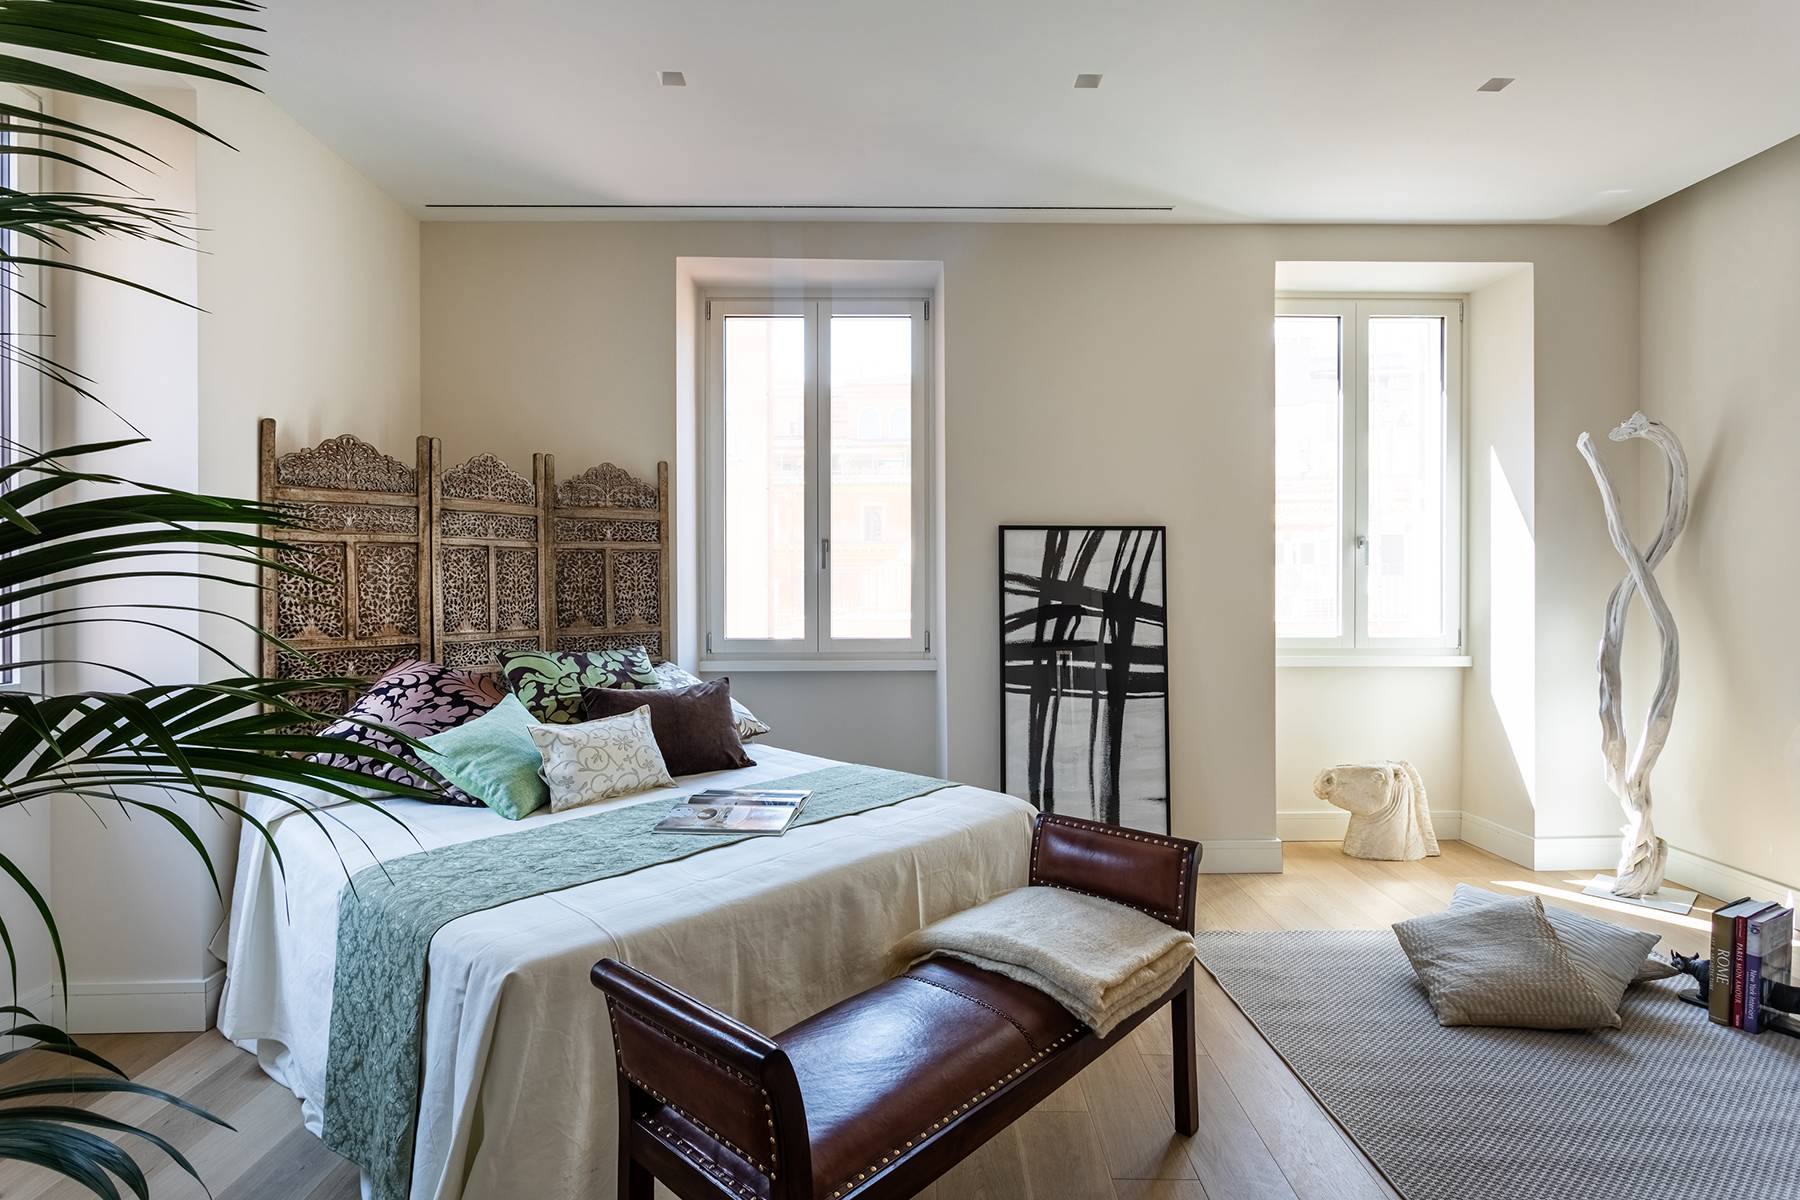 Spanish Steps luxury turnkey apartment - 1